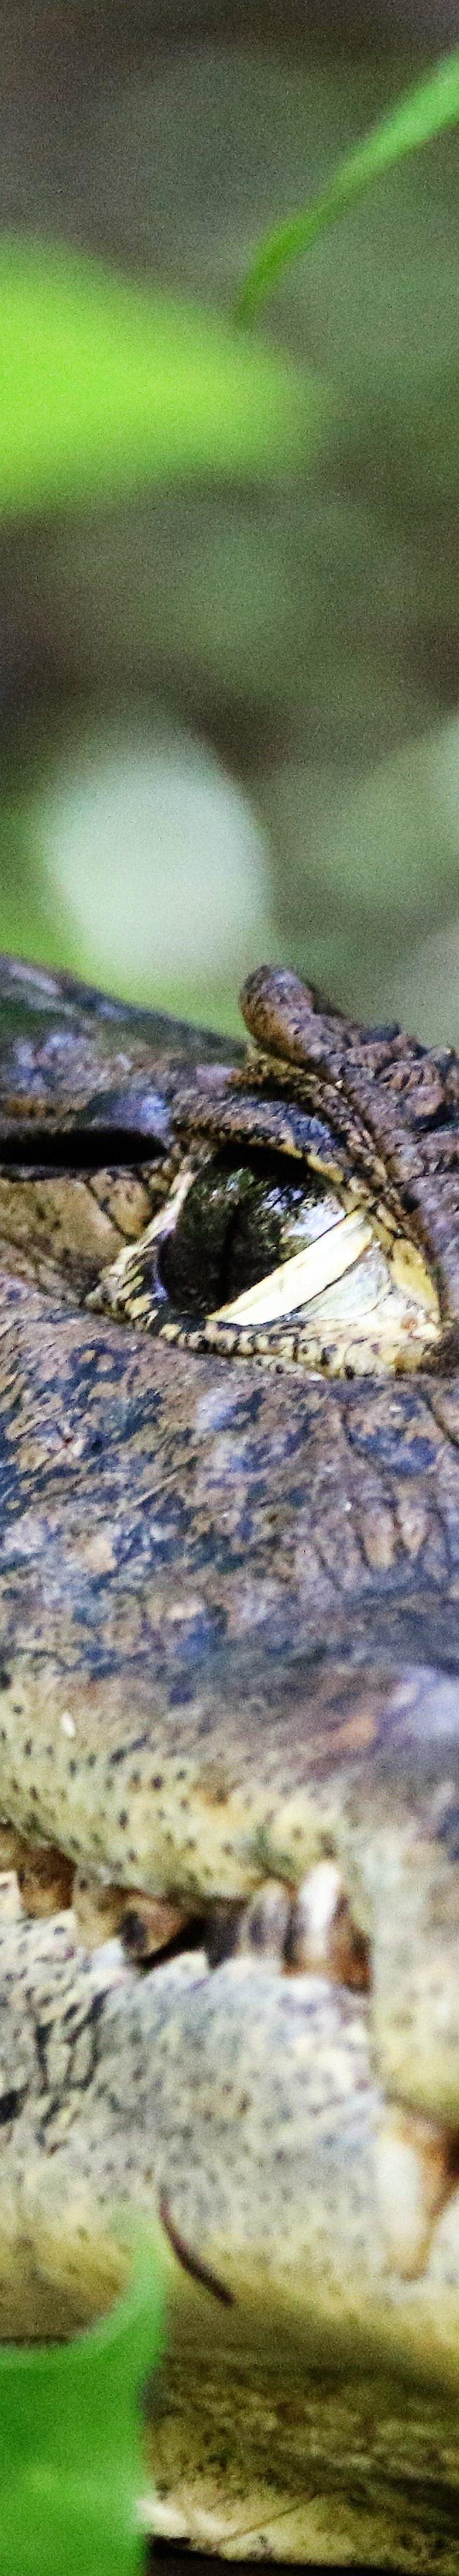 Krokodil / Crocodile (Crocodylidae)